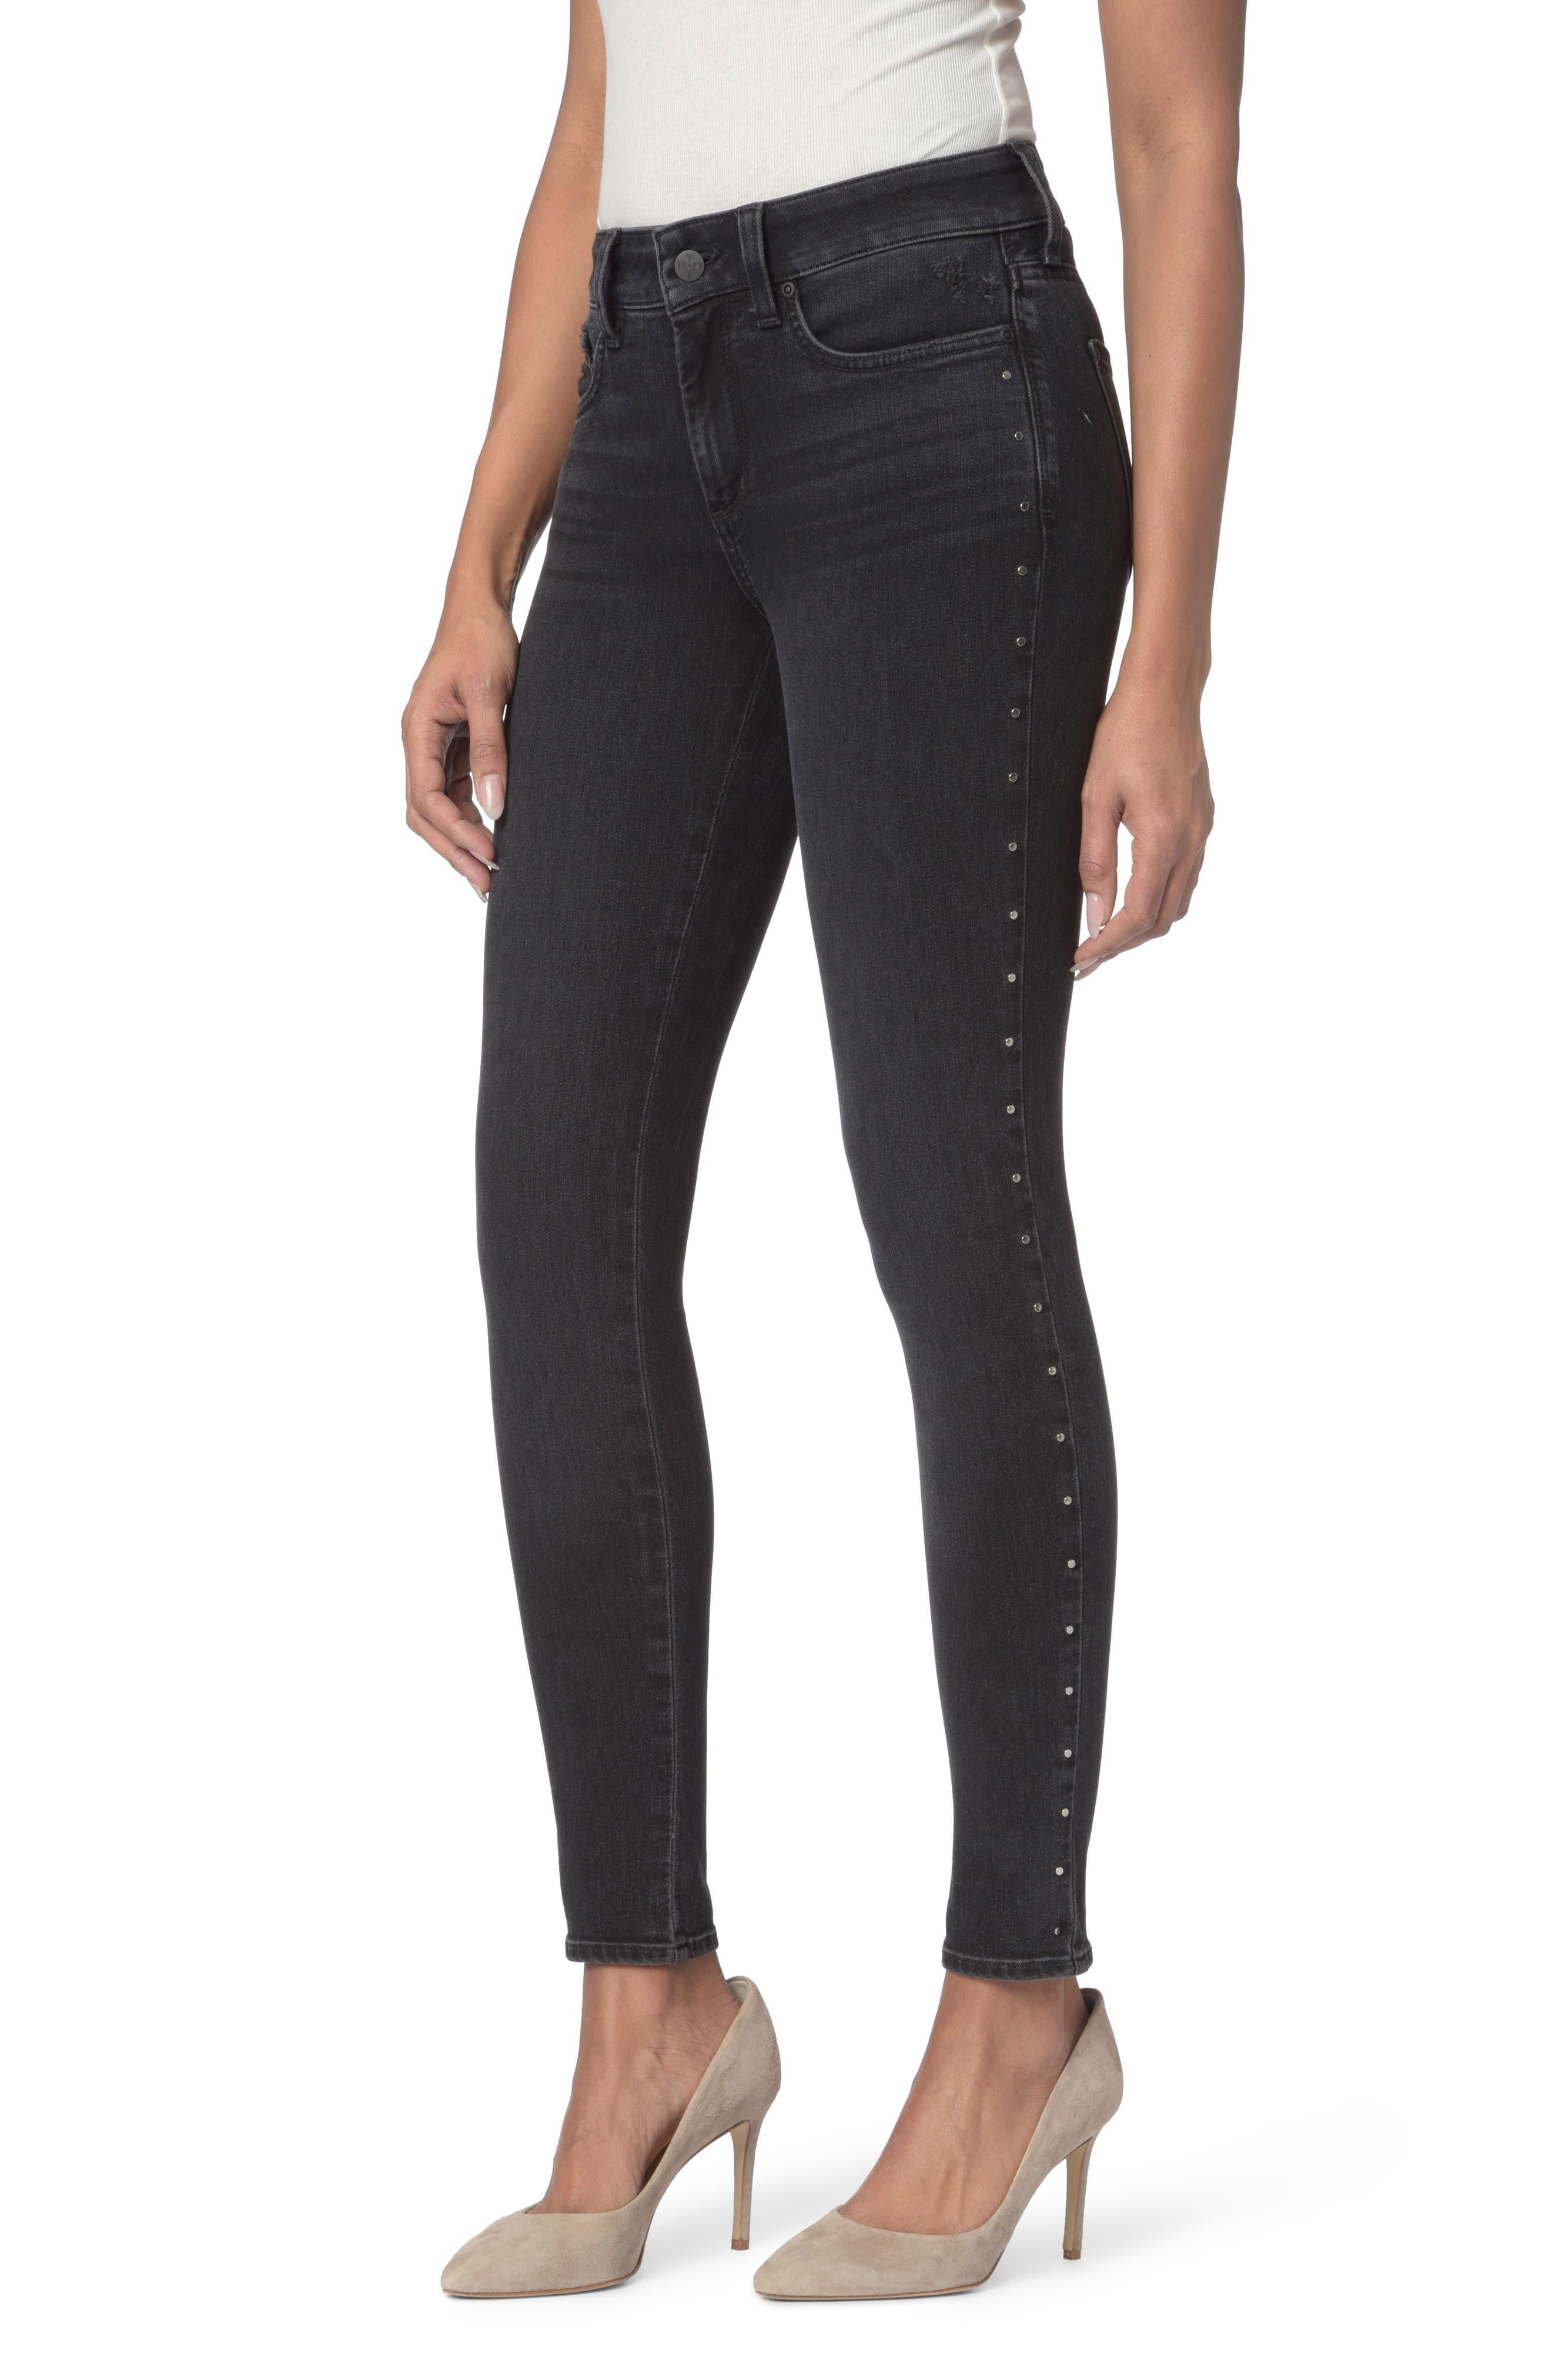 Alternate Image 1 Selected - NYDJ Ami Embellished Stretch Skinny Jeans (Campaign) (Regular & Petite)